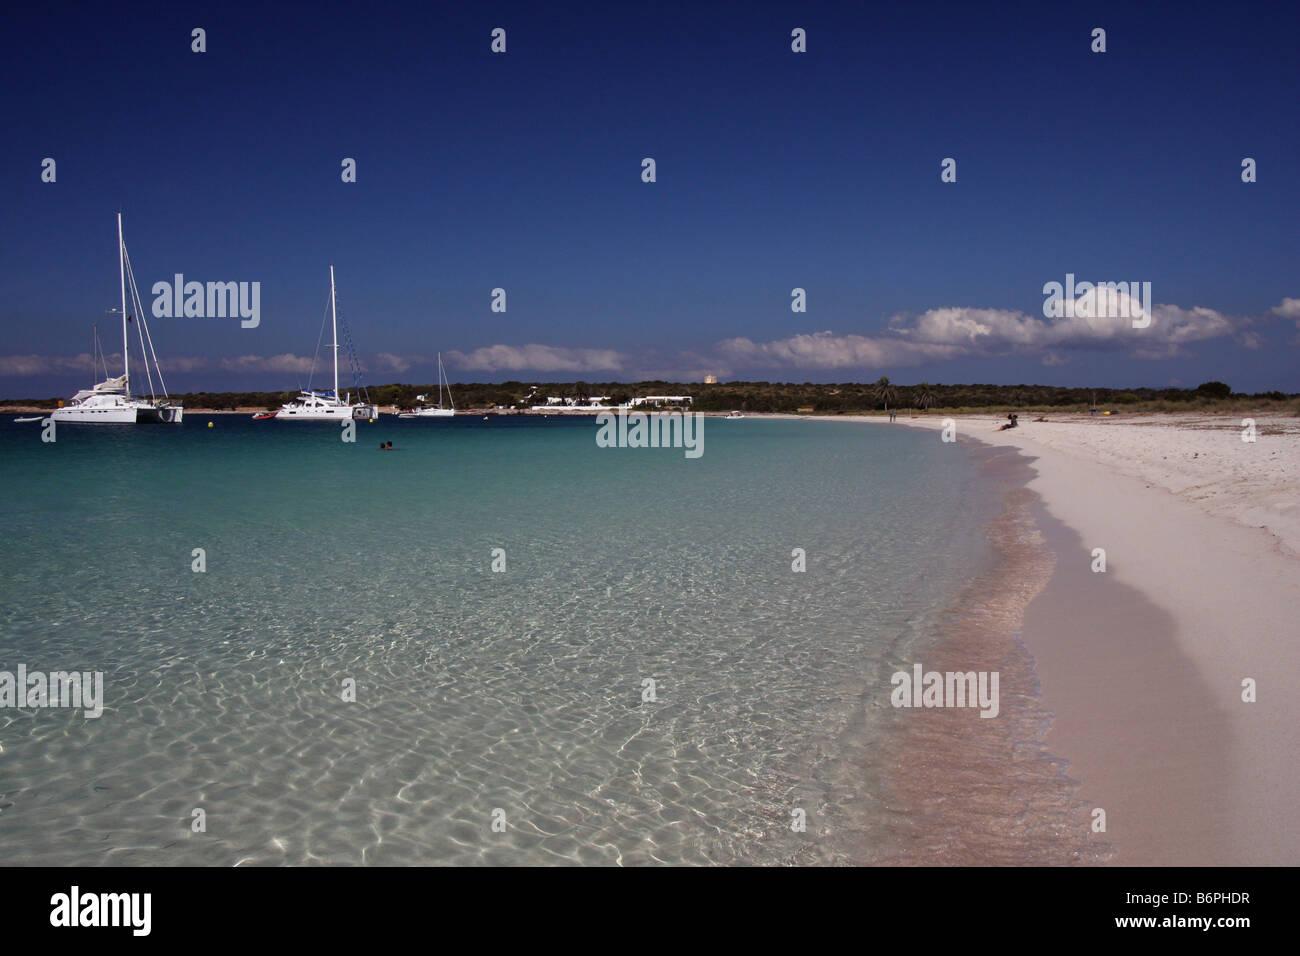 Sailing ships anchored in Isla de S'Espalmador, a small island next to Formentera and Ibiza, seen from the beach - Stock Image